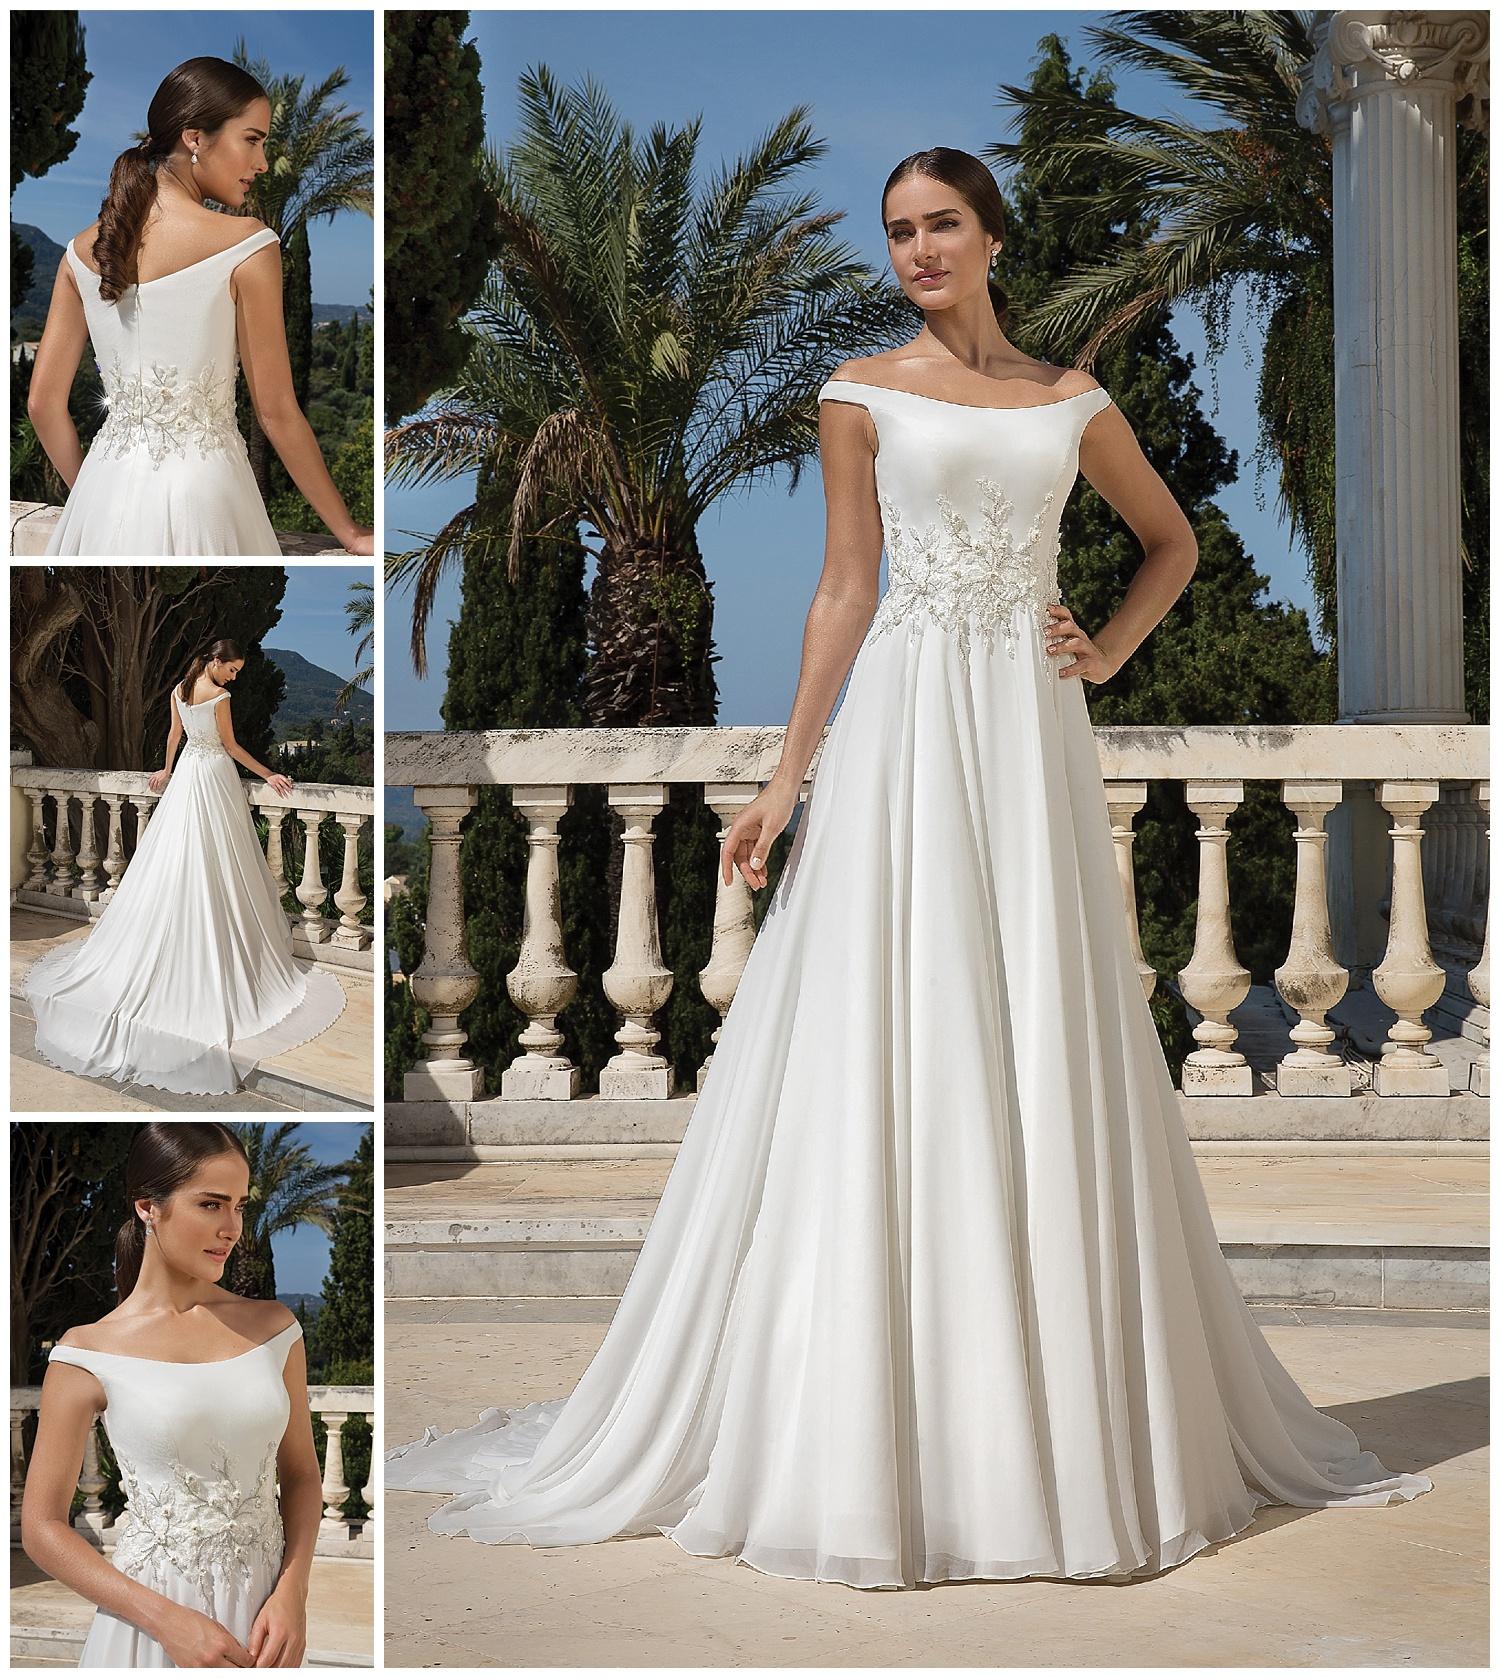 justin-alexander-88092-off-shoulder-wedding-dress-epiphany-boutique-carmel-california.jpg